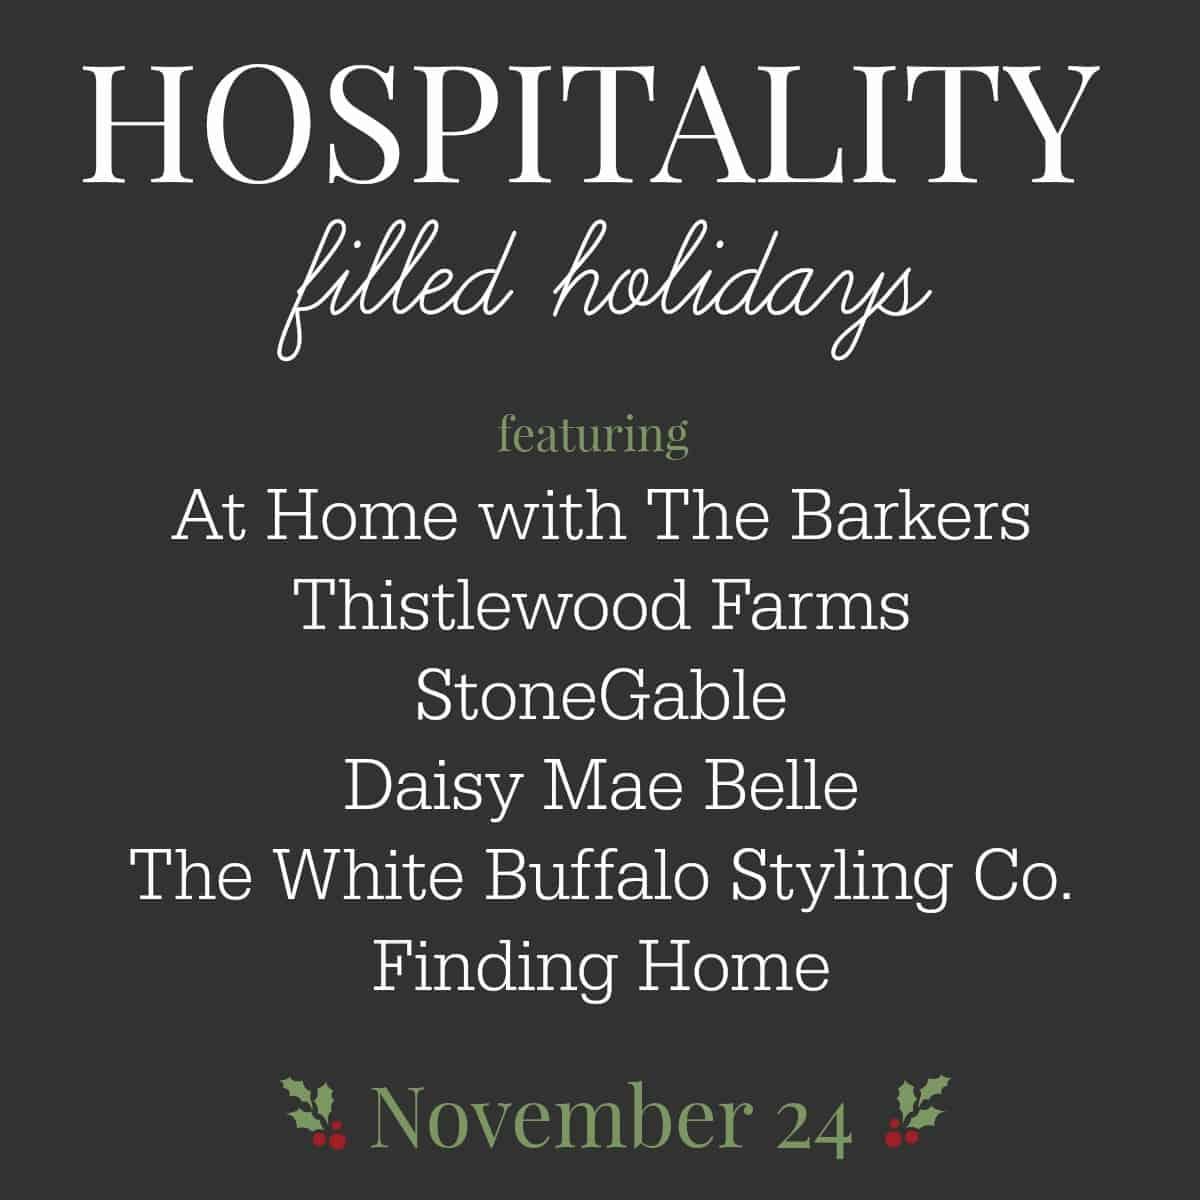 Hospitality filled Holiday